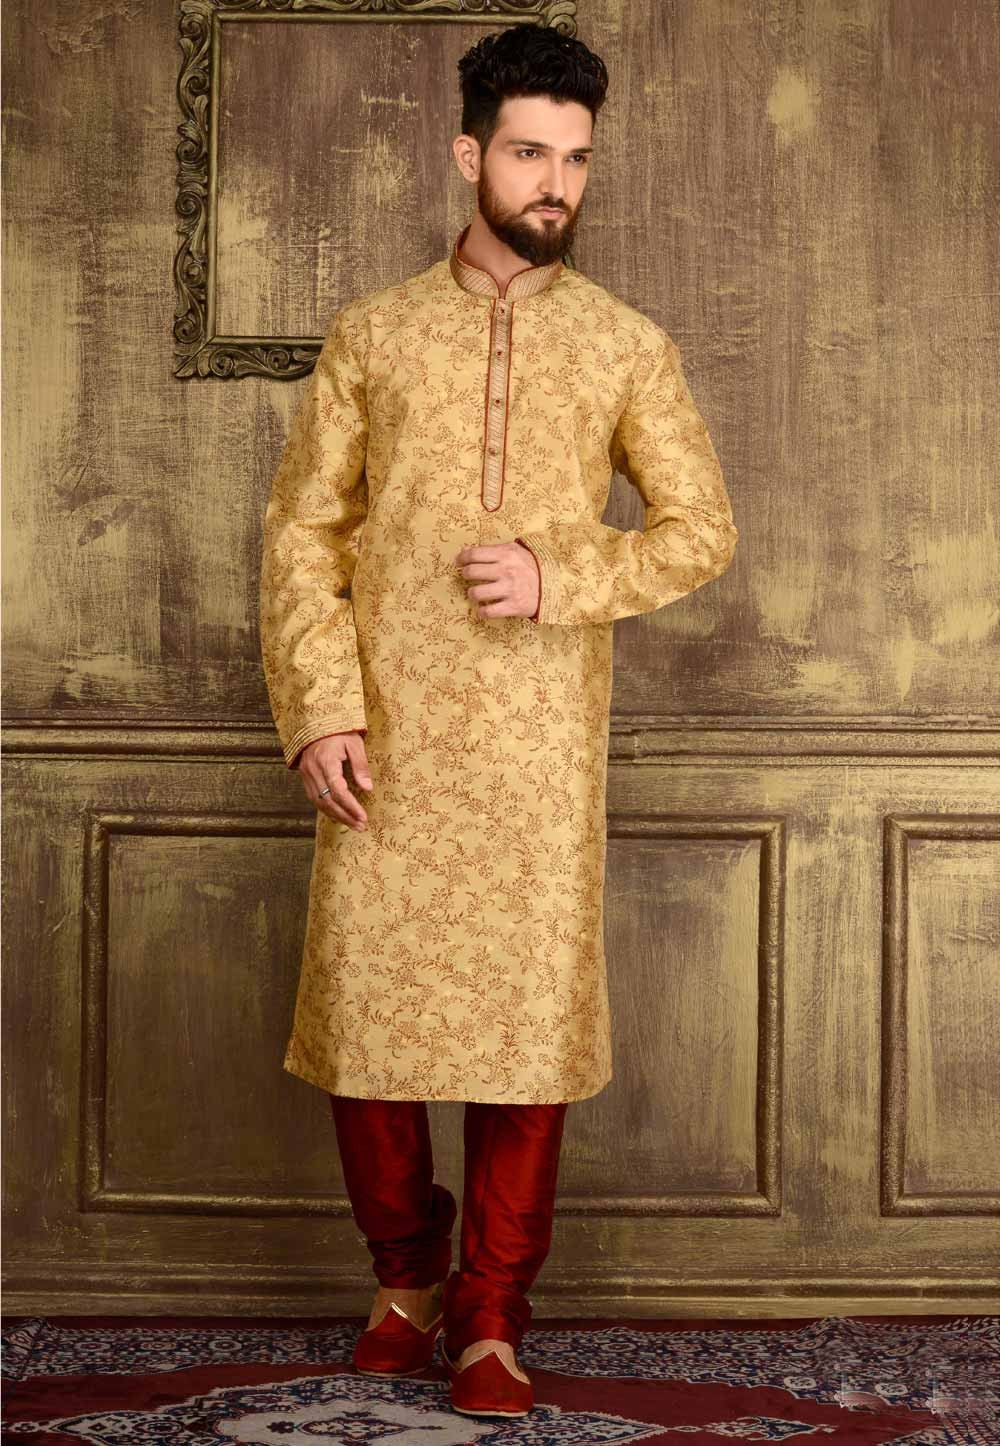 Exquisite Chinese Collar Men's Gold Color Readymade Kurta Pajama.